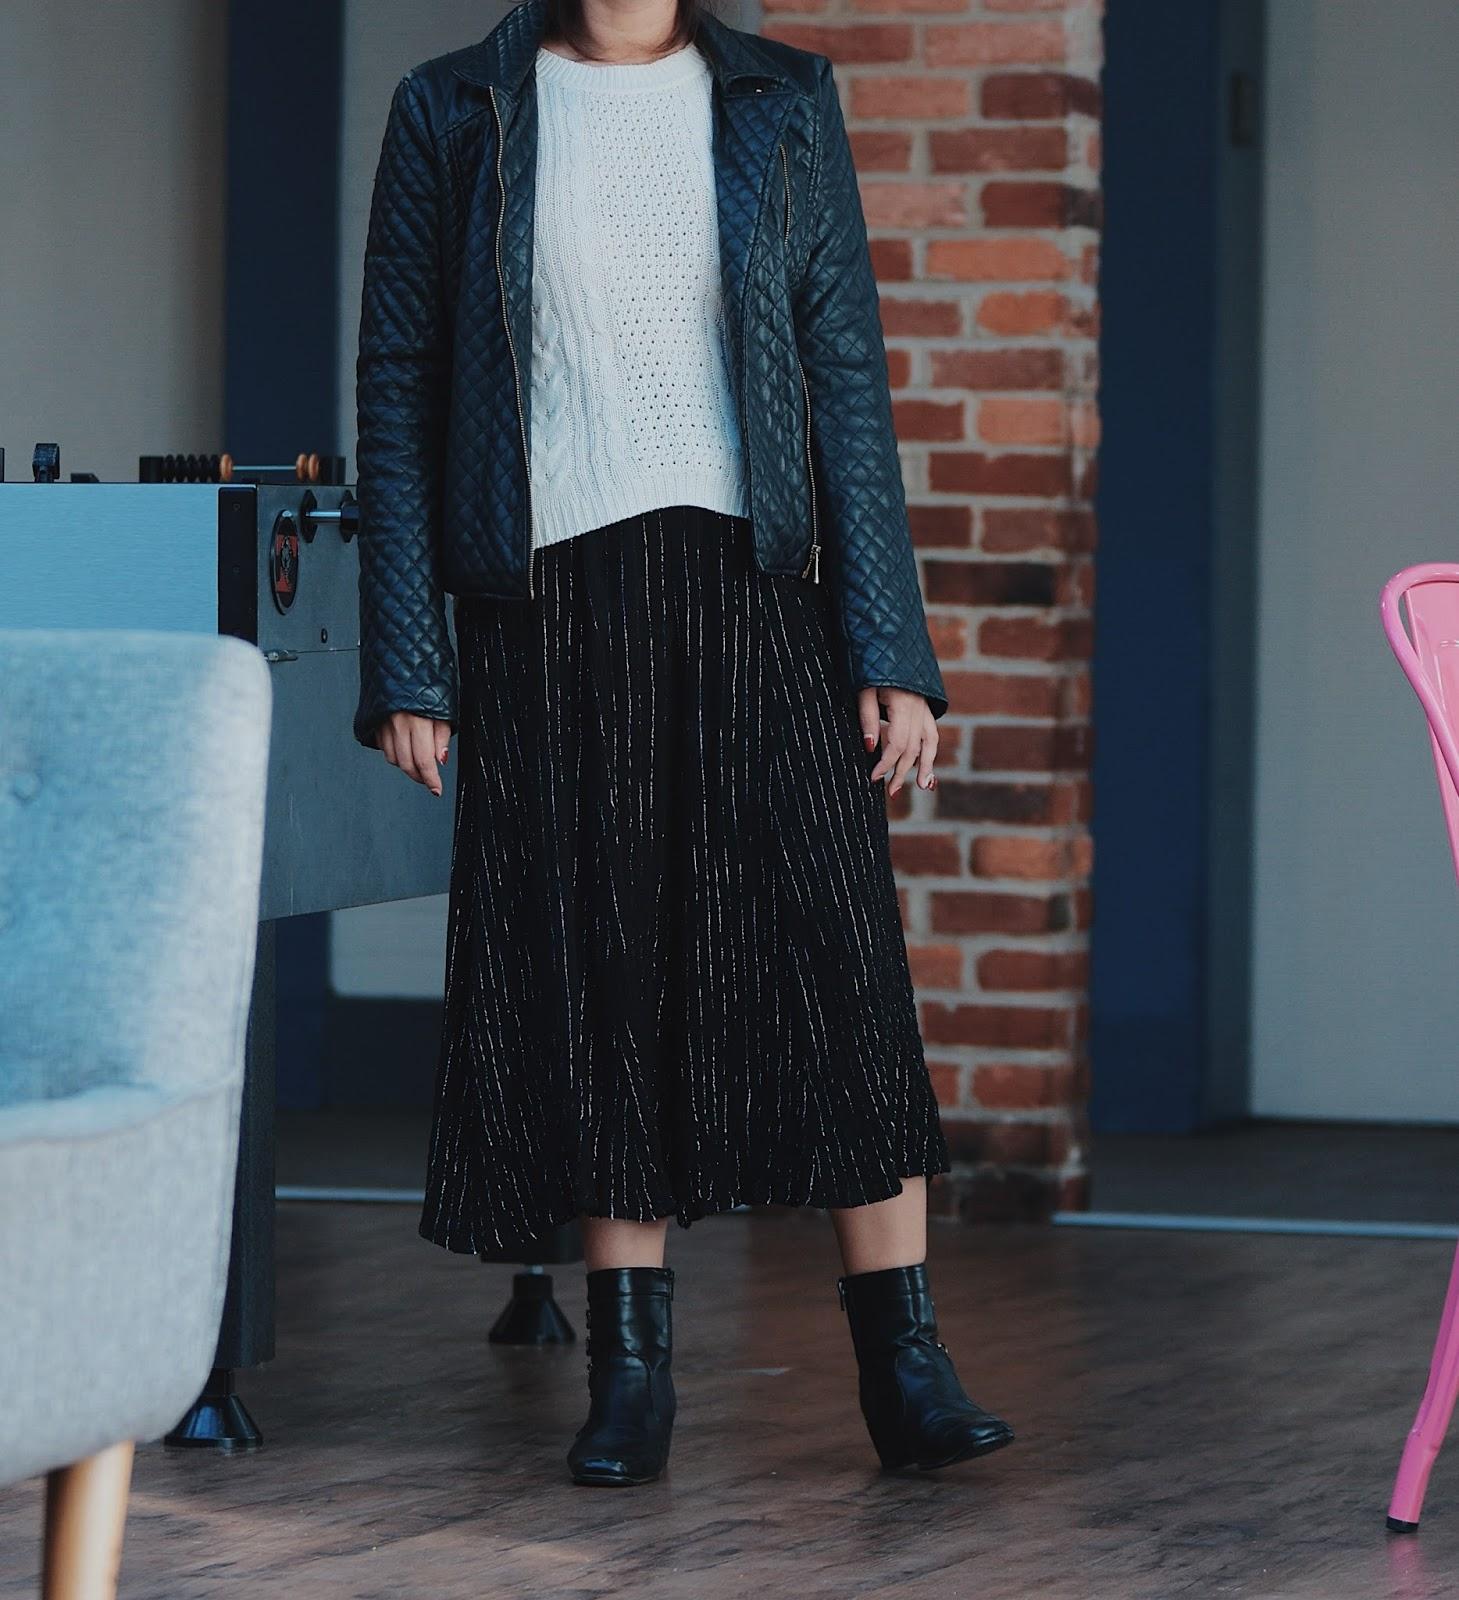 Back To Basics - mariestilo-fashionblogger-fashionideas-moda-streetstyle-dcblogger-armandhugon-marisolflamenco